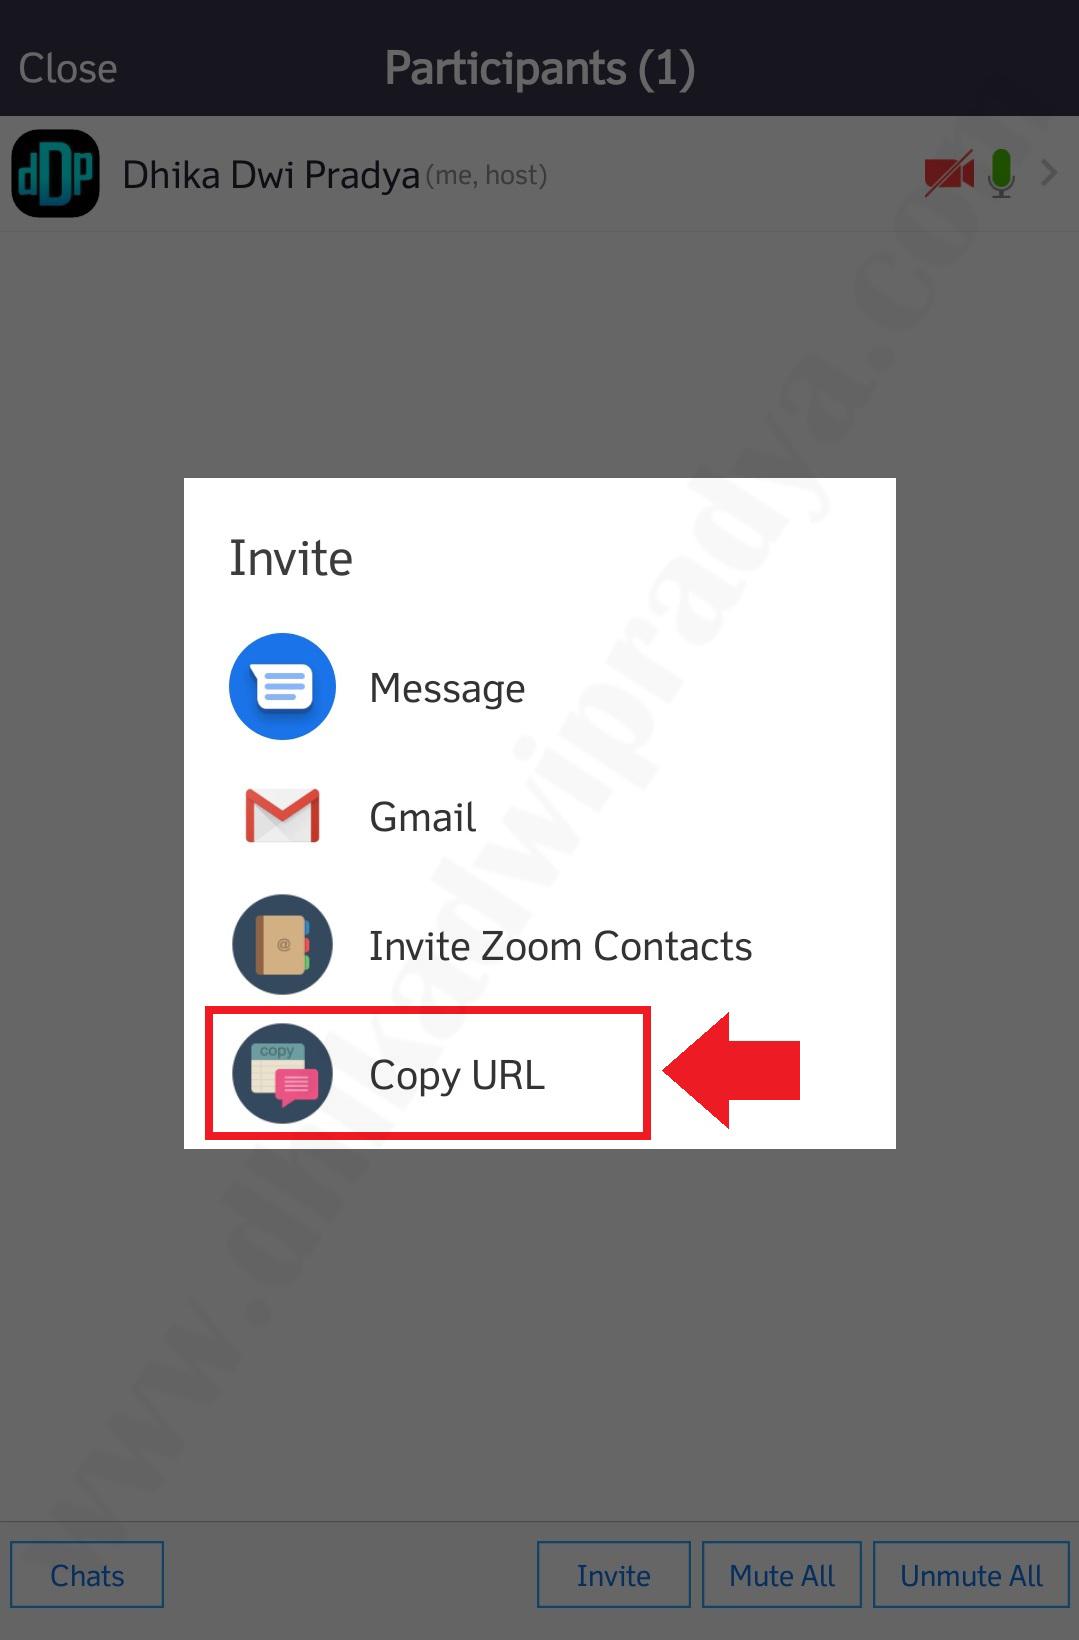 tutorial-cara-menggunakan-aplikasi-zoom-cloud-meeting9-dhikadwipradya